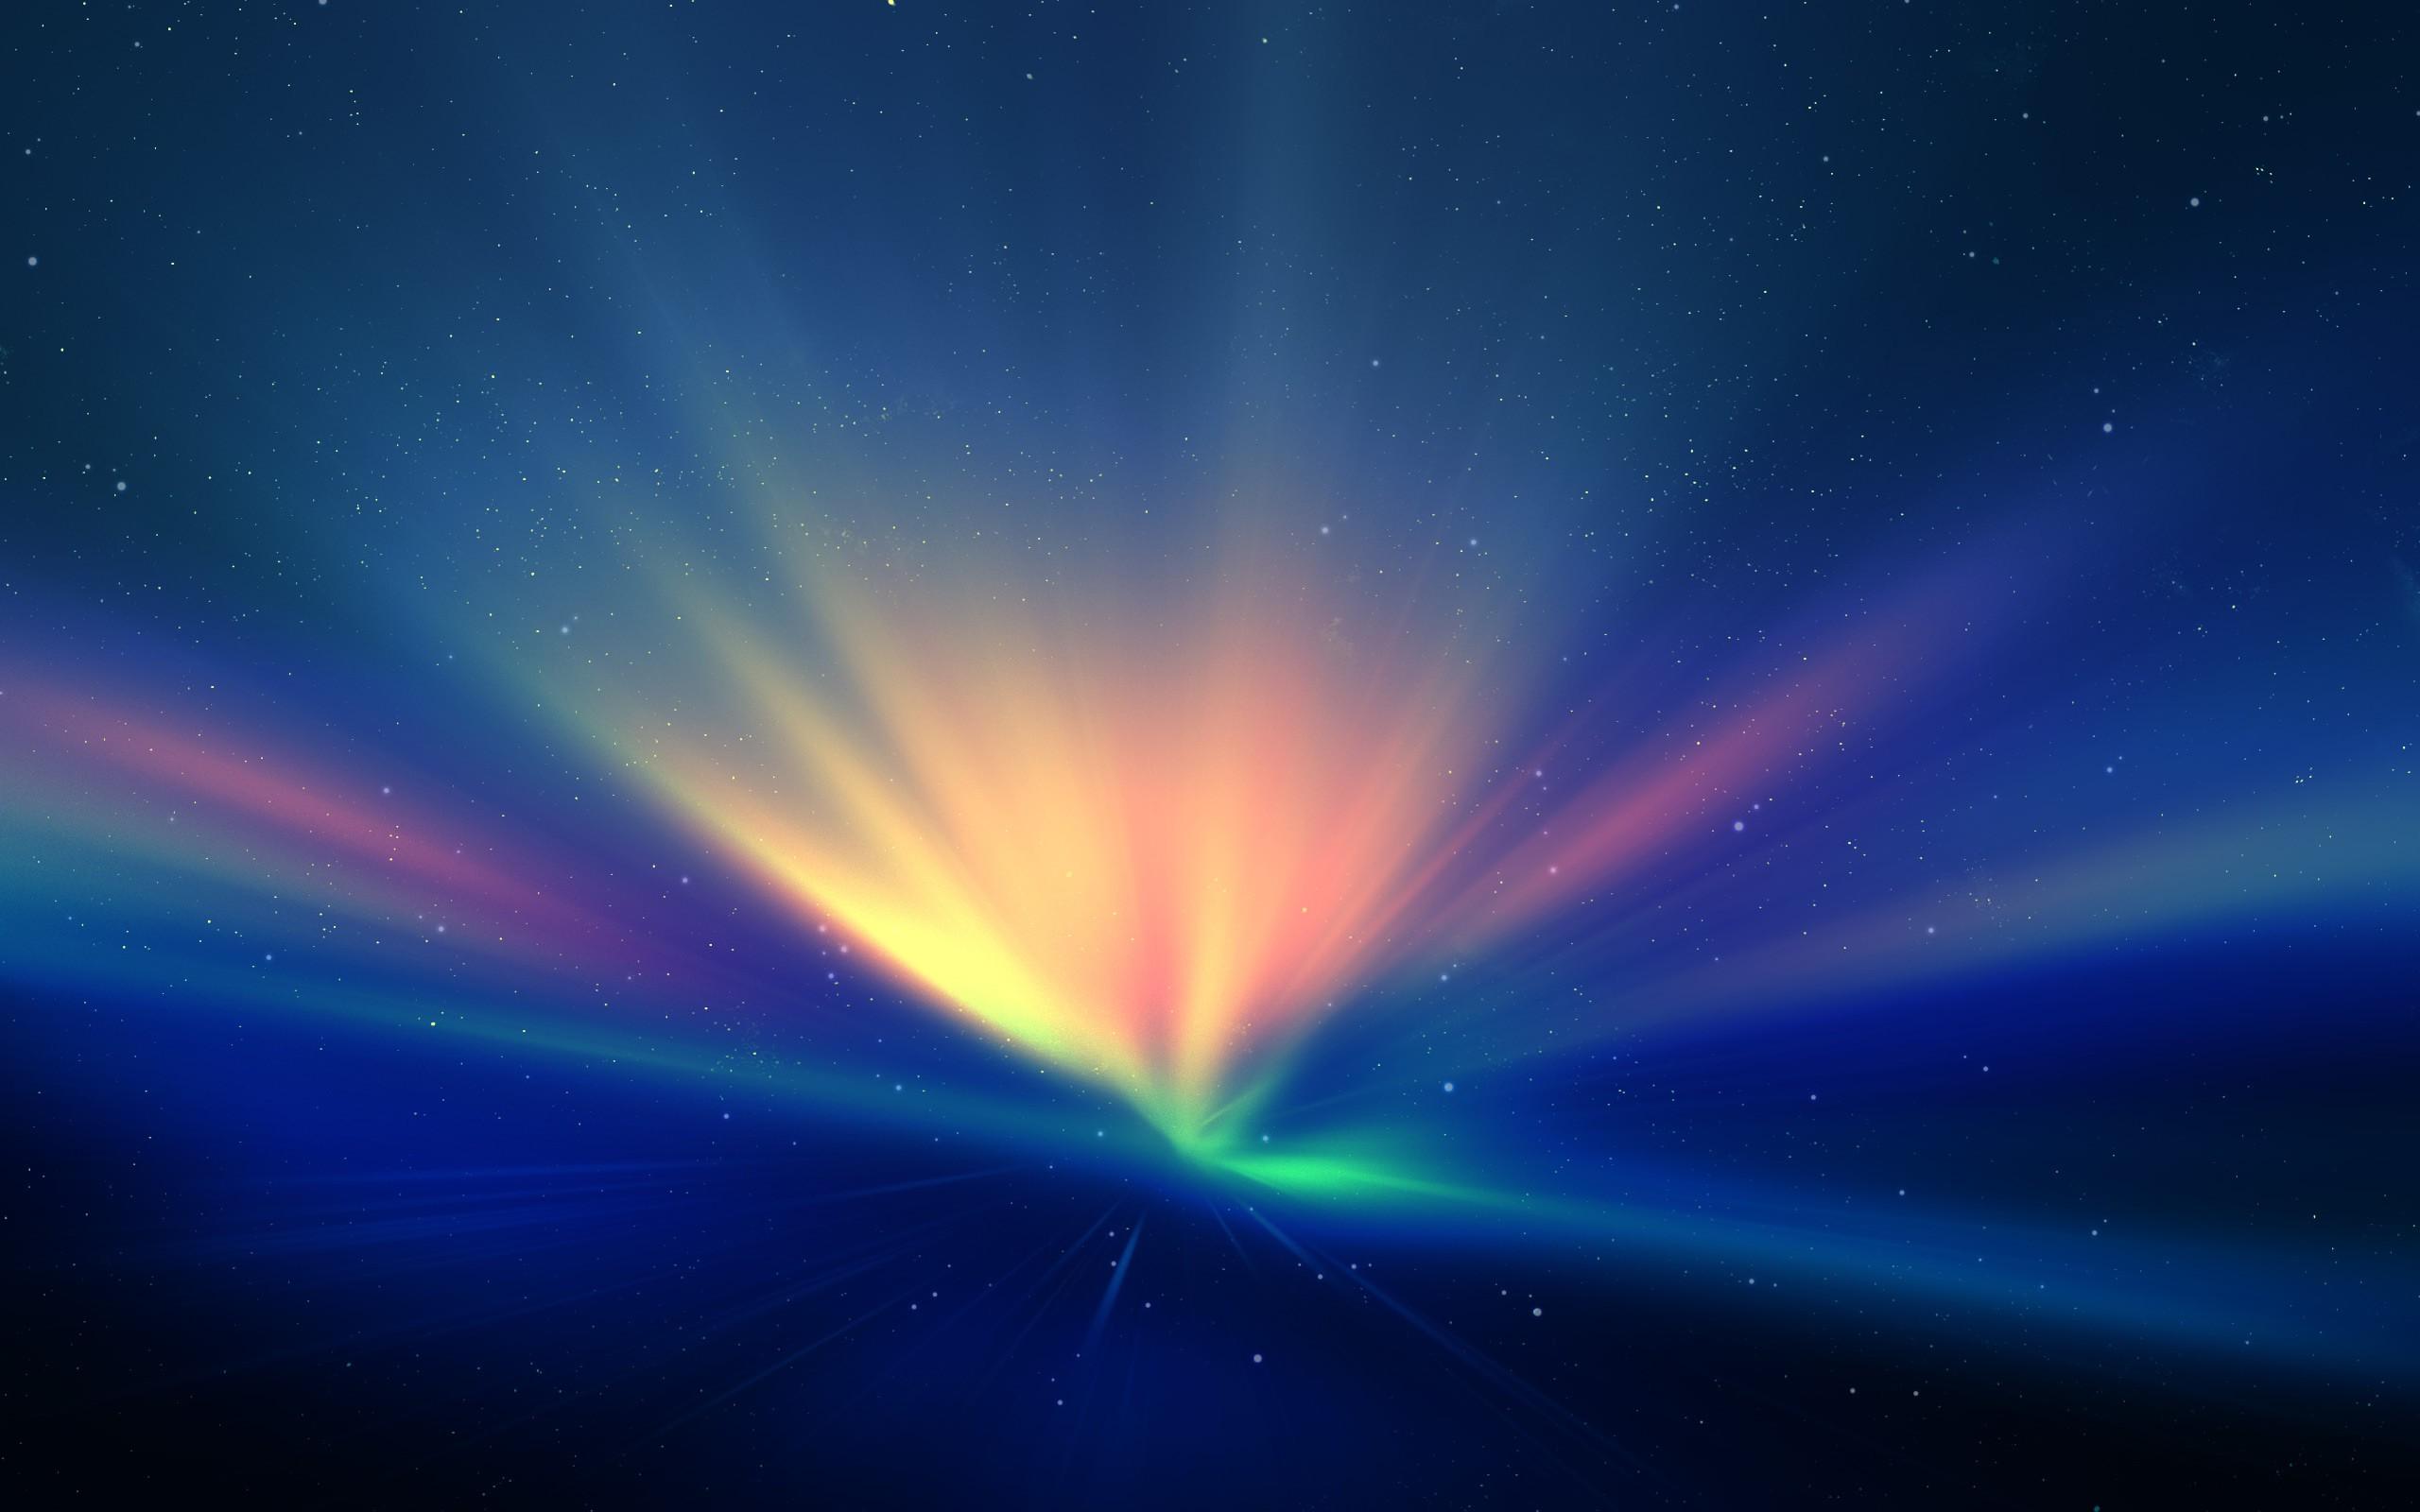 Wallpaper Sunlight Abstract Sky Atmosphere Aurora